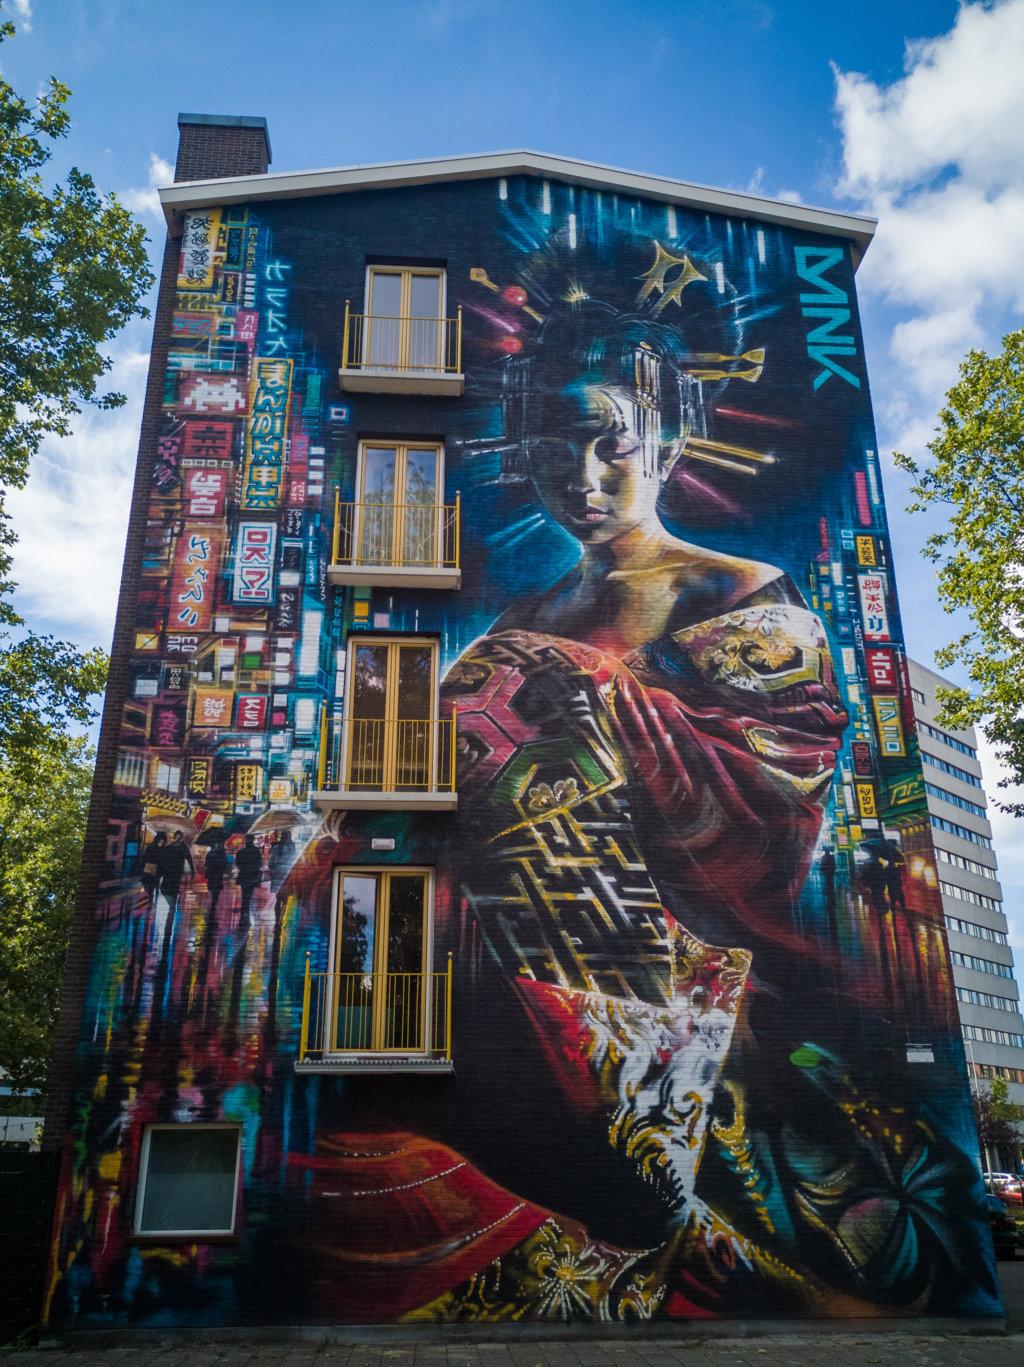 Platanenweg-Street-art-di-Amsterdam